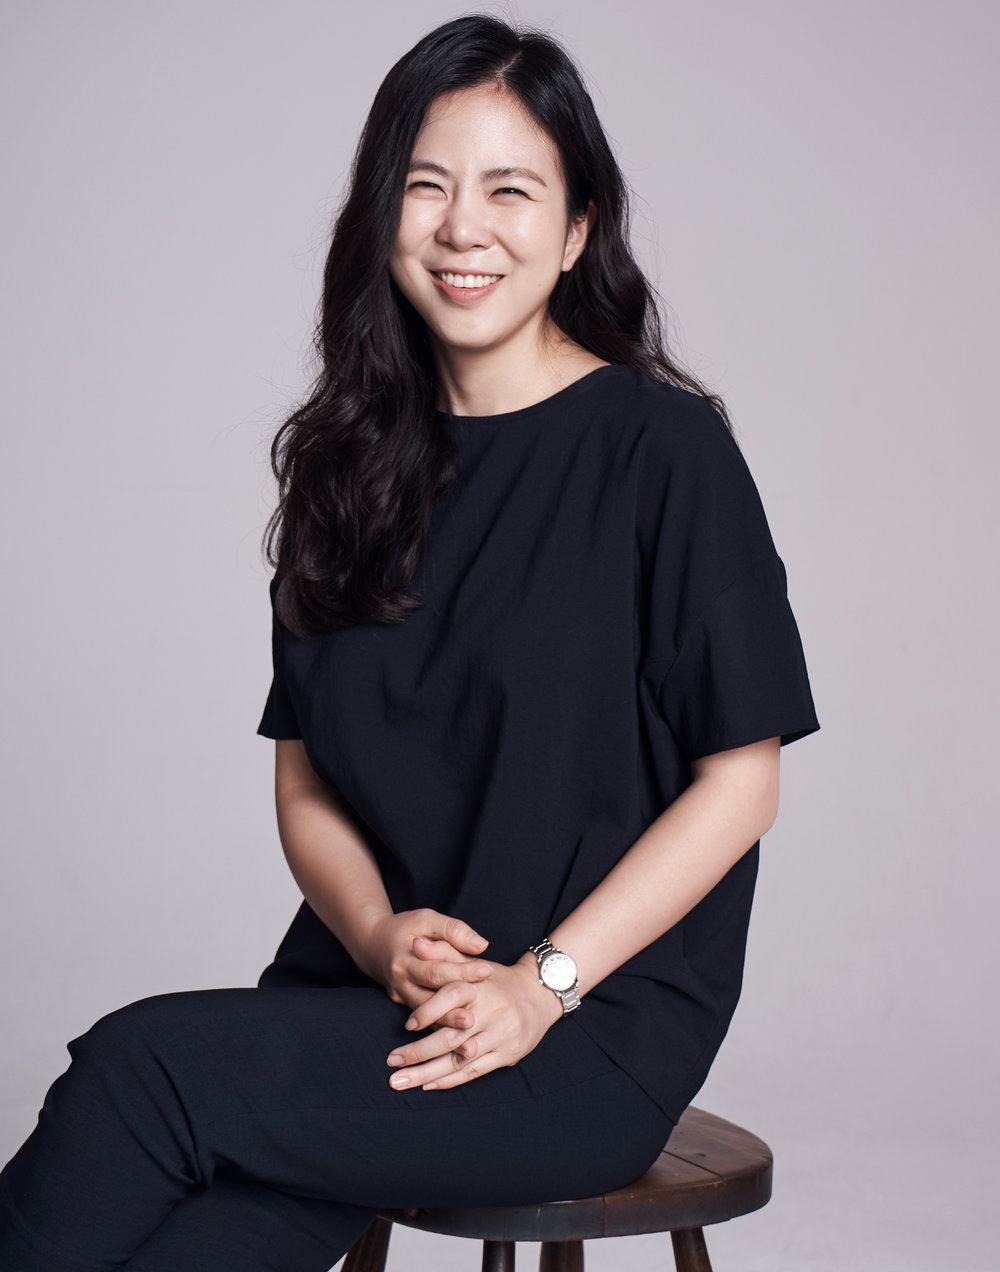 Monica-Kang-2018.jpg